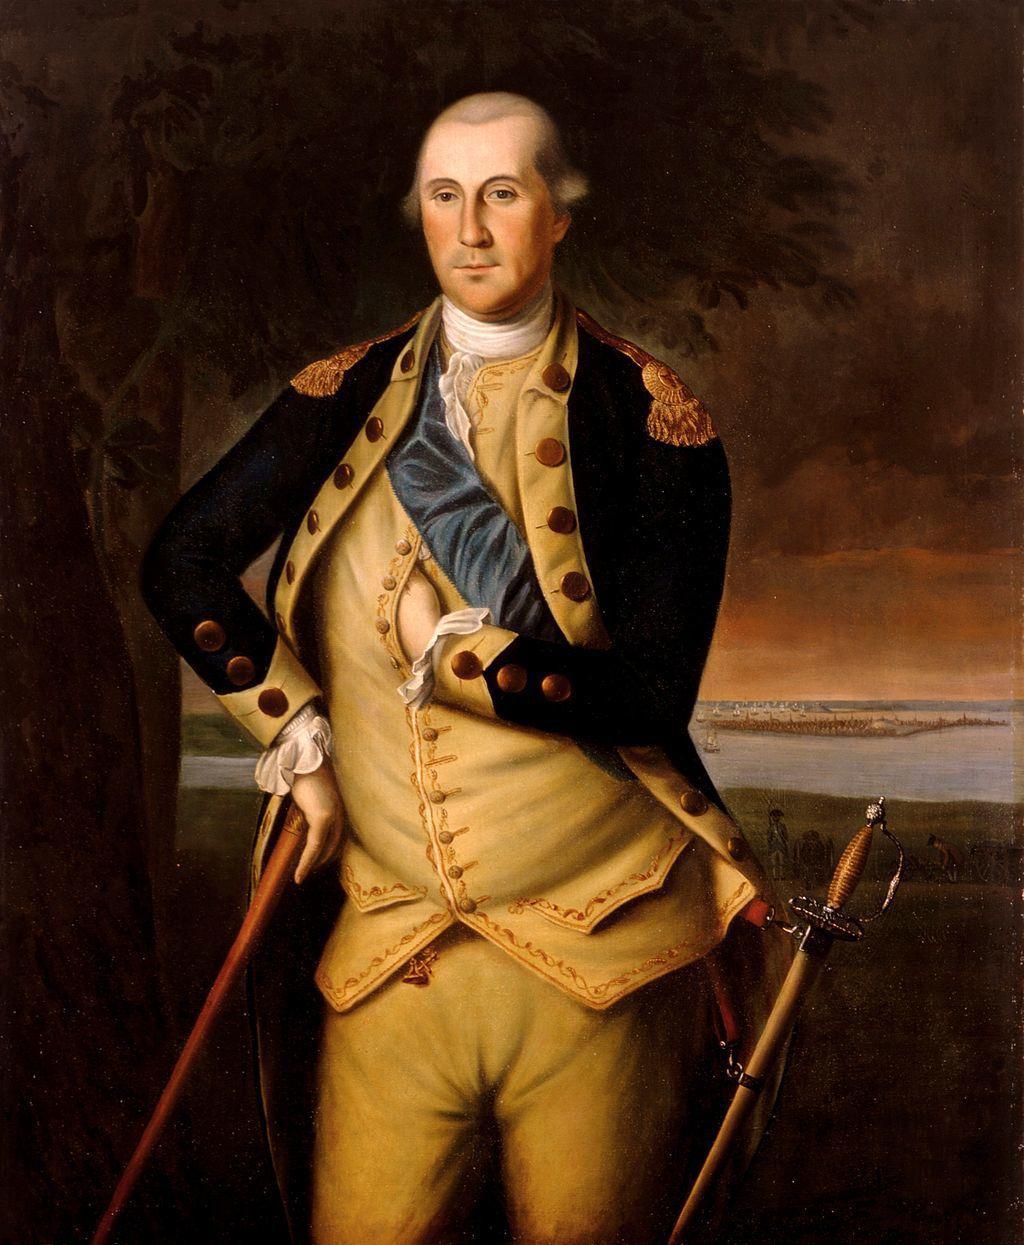 Portrait of George Washington, 1776